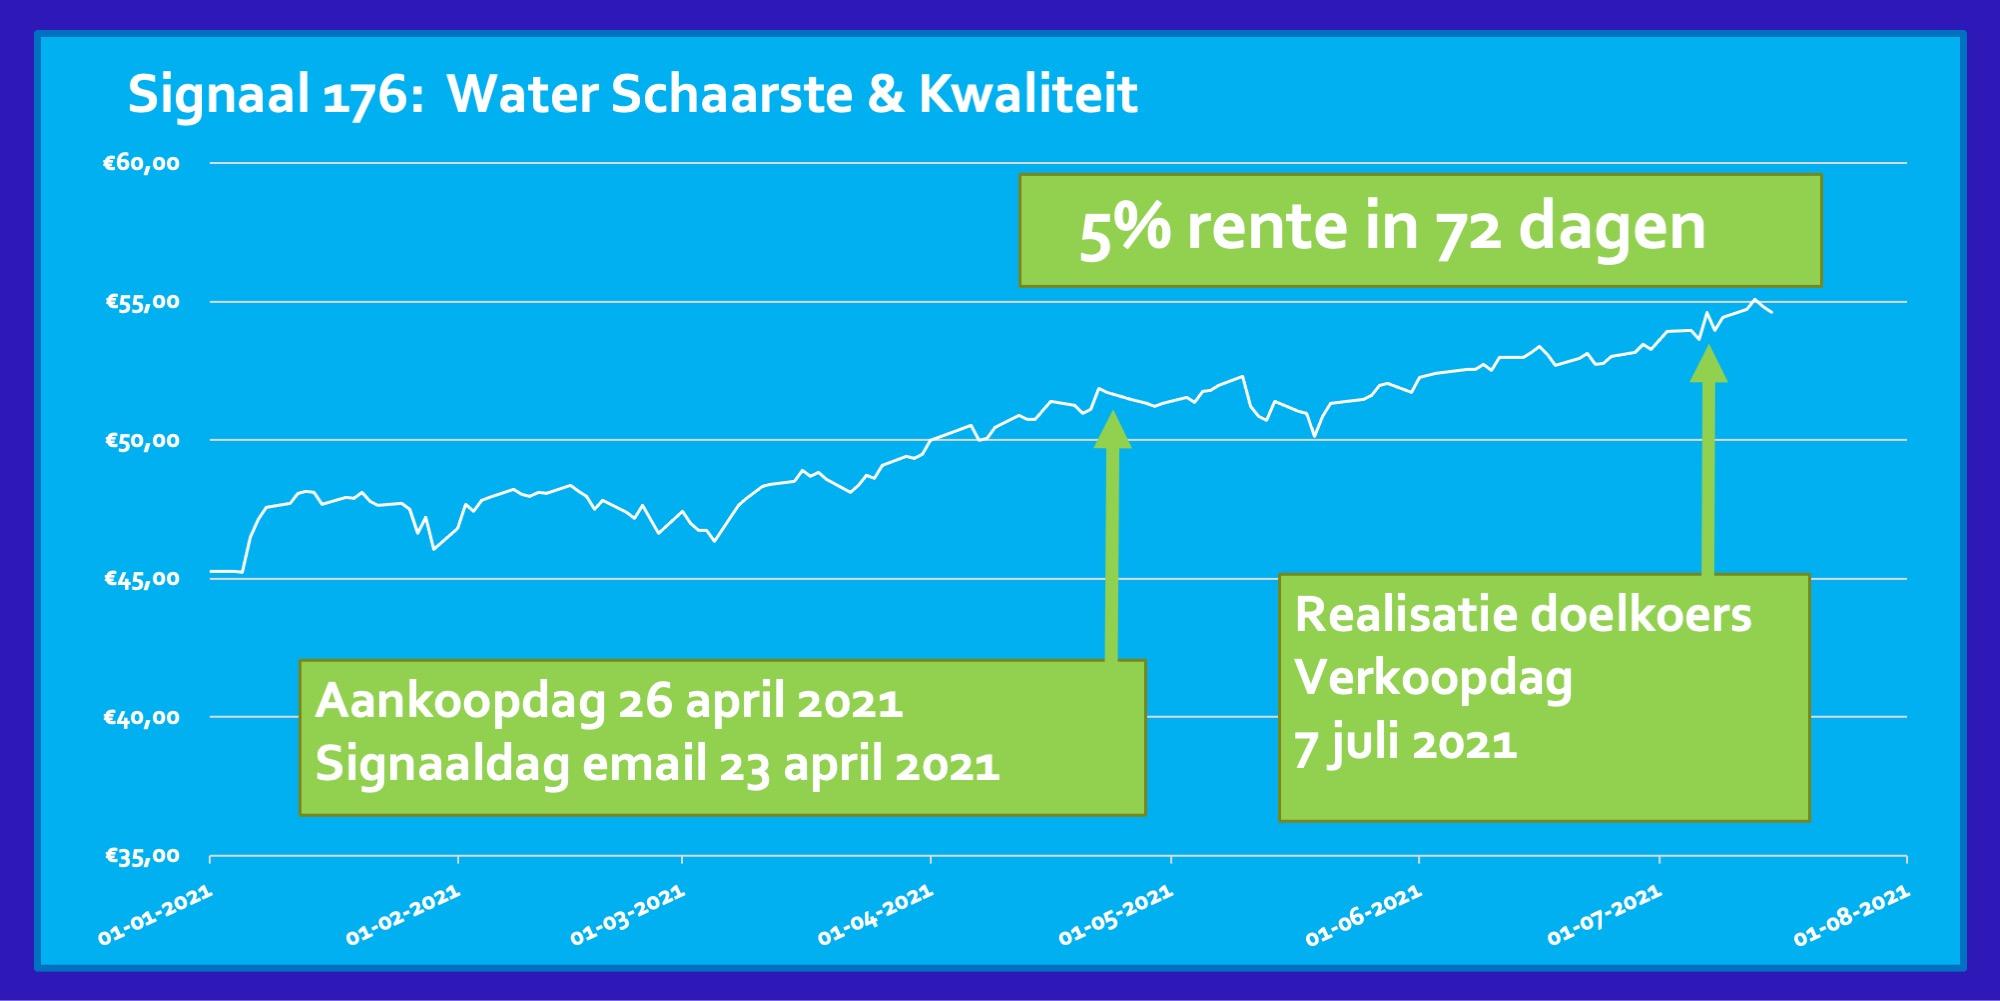 ETF Water Schaarste & Kwaliteit 5 procent in 72 dagen